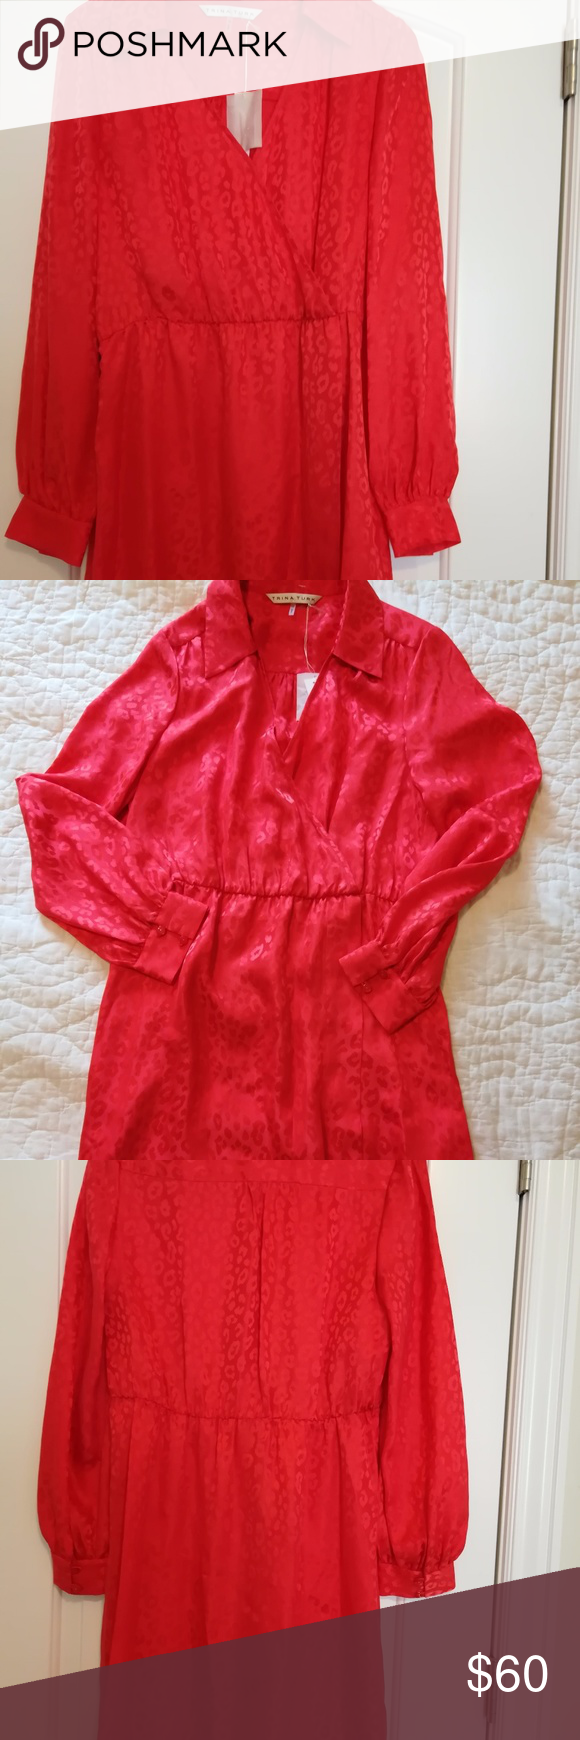 Nwt trina turk size wrap dress red silk trina turk red silk